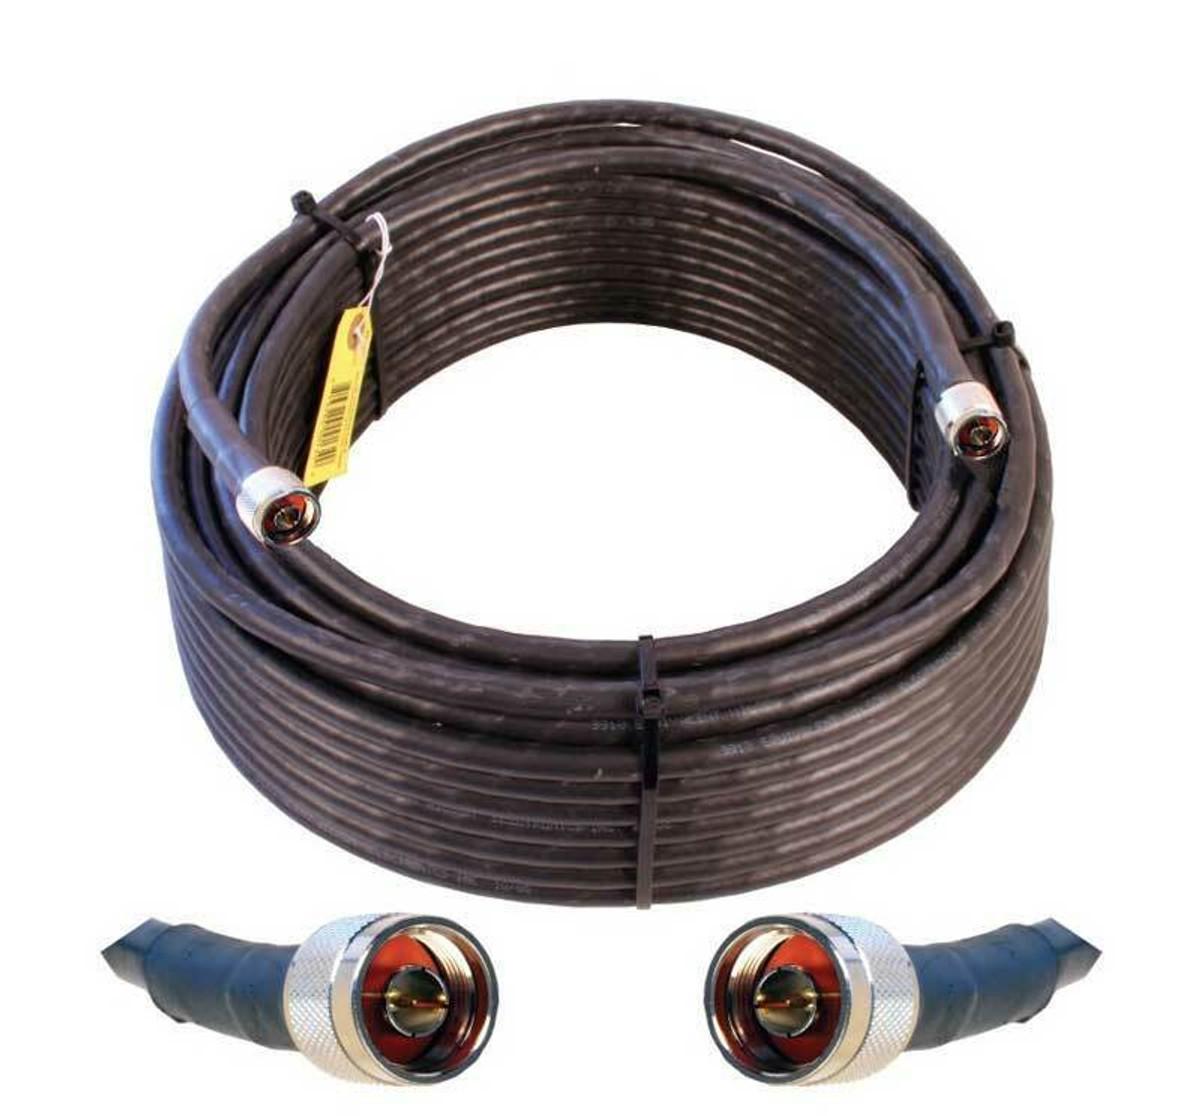 weBoost (Wilson) 952300 Wilson 400 N-Male to N-Male | 100 ft Black Cable